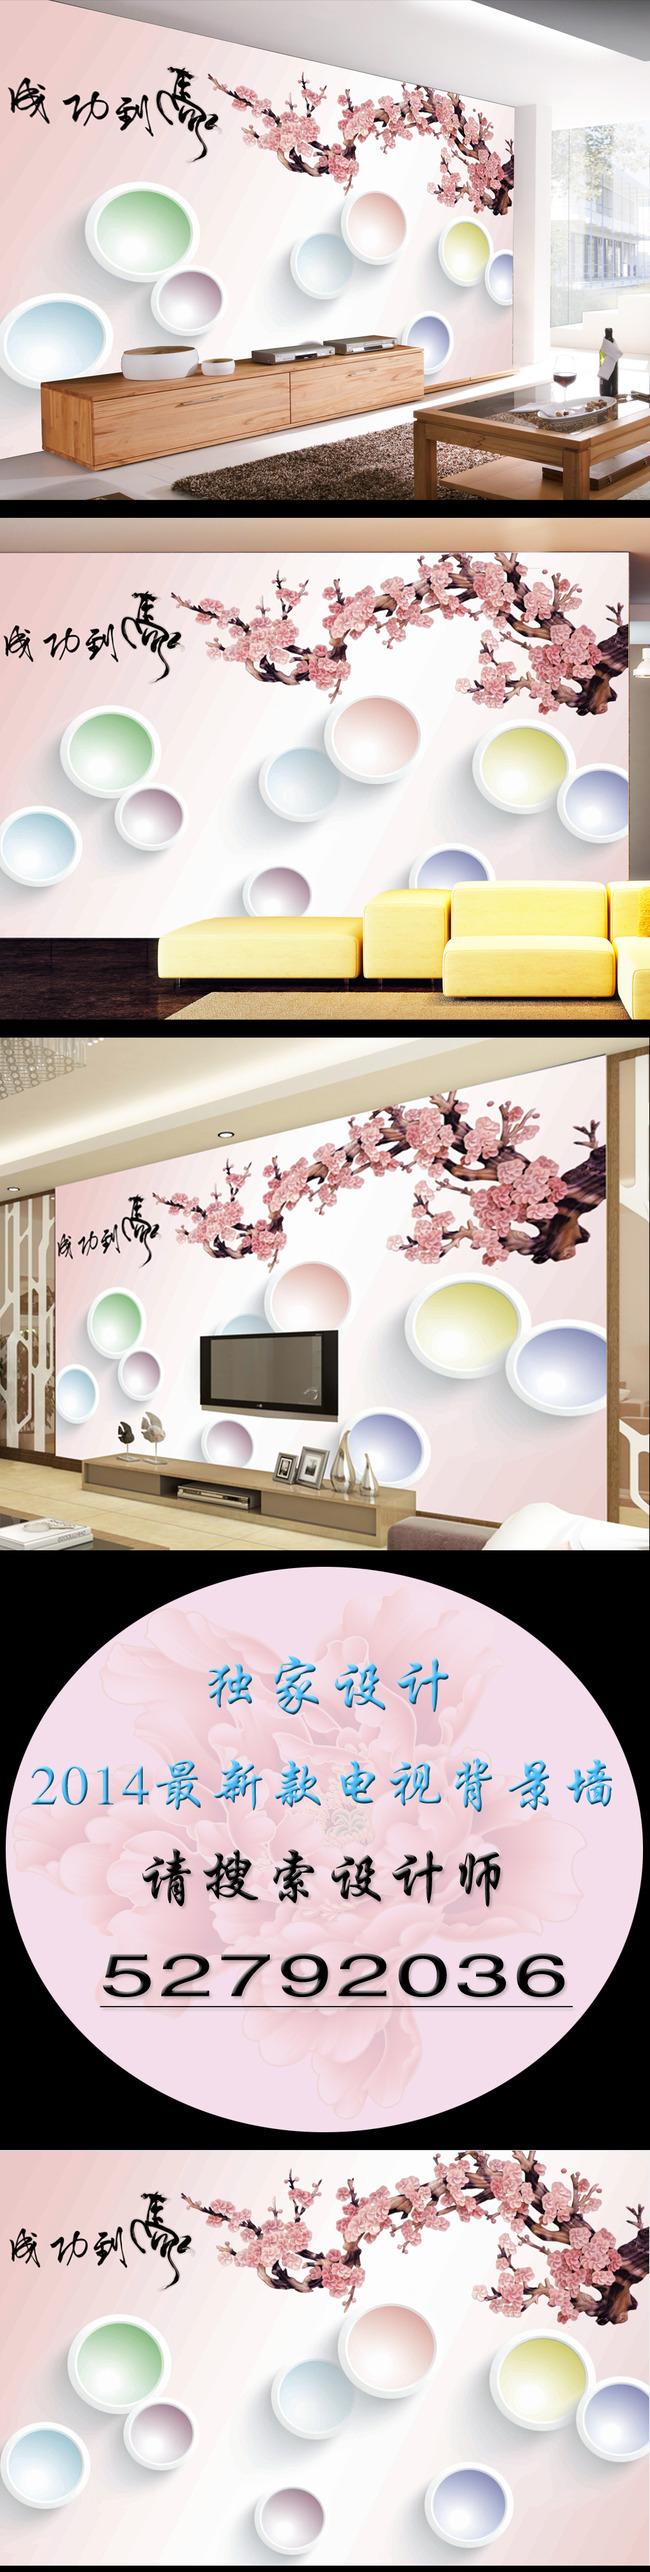 3d手绘梅花背景墙图片下载 3d马到成功 彩圈梅花背景墙 手绘梅花背景